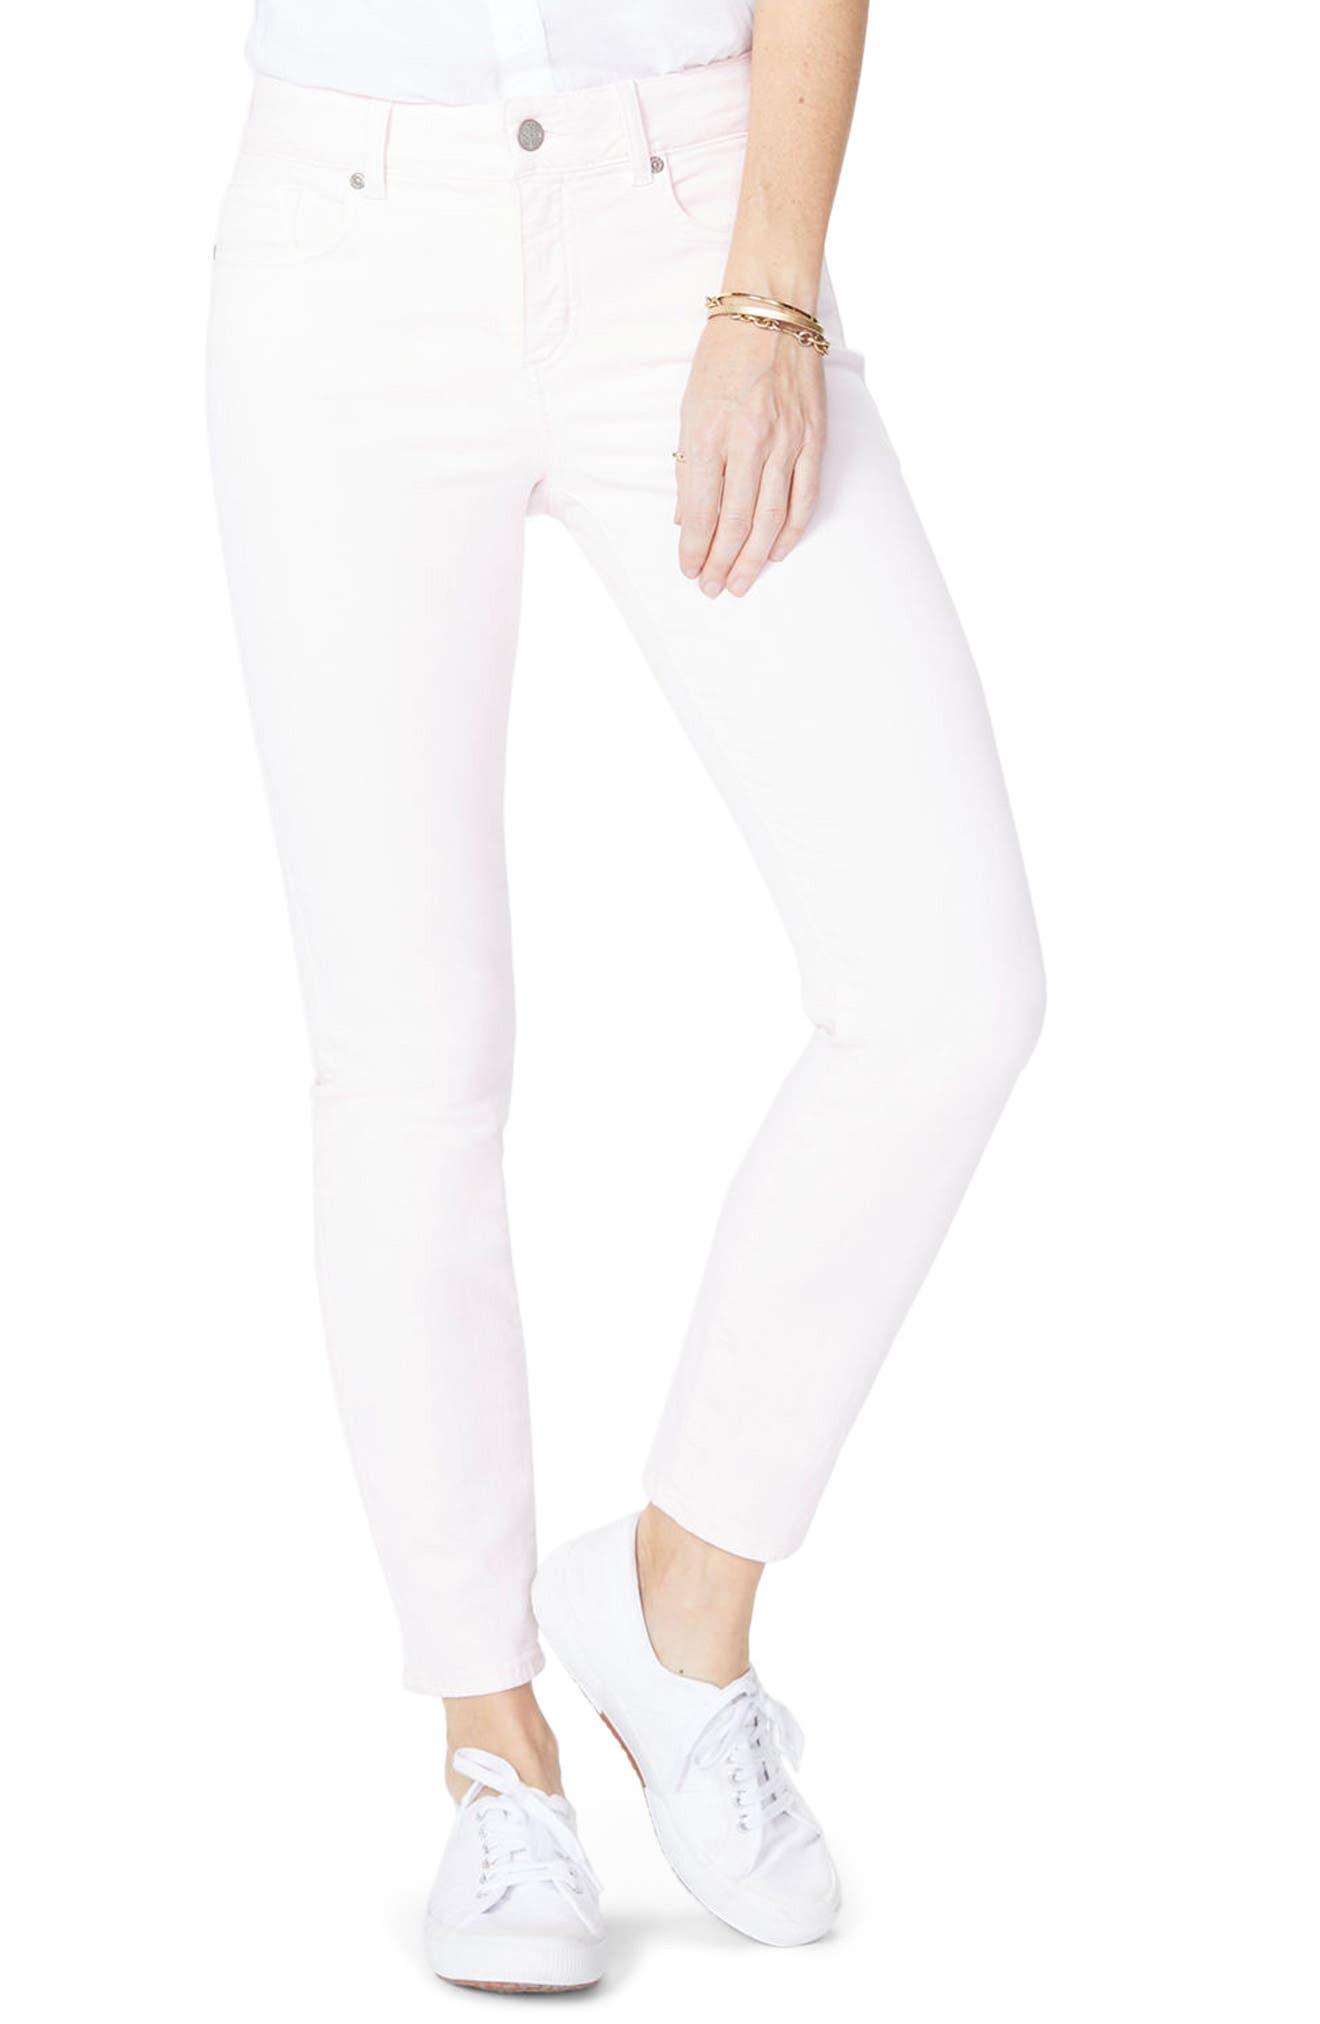 Main Image - NYDJ Alina Ankle Jeans (Light Primrose)